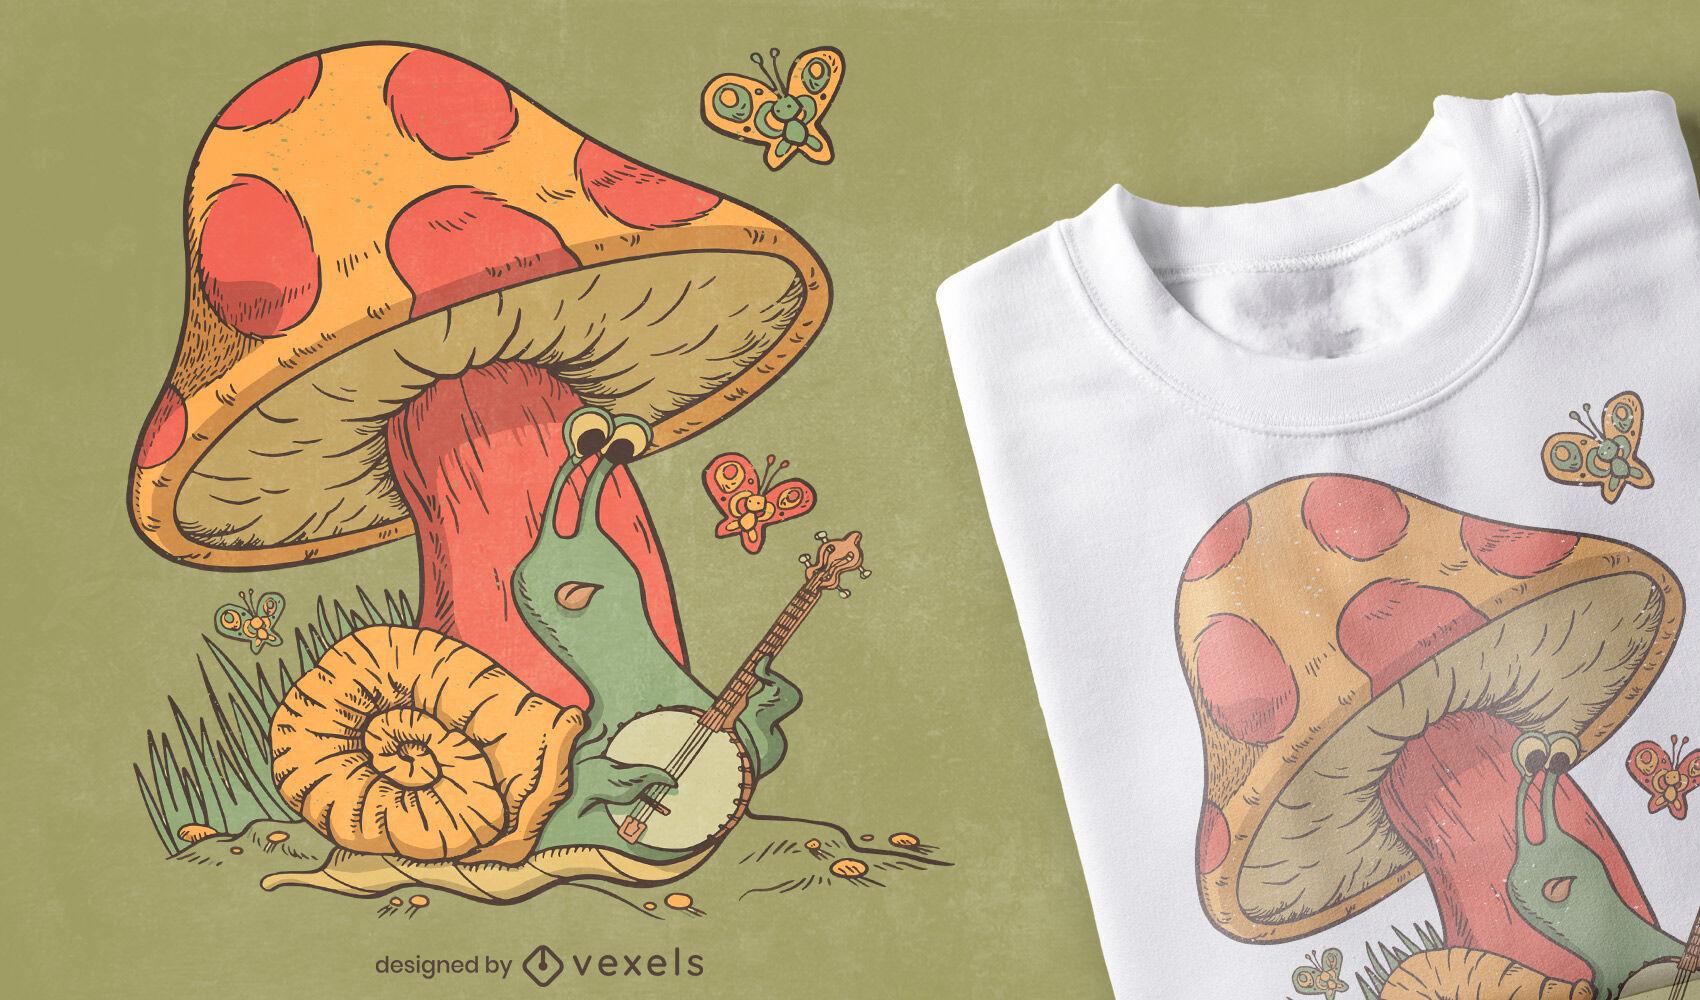 Snail playing banjo and mushroom t-shirt design